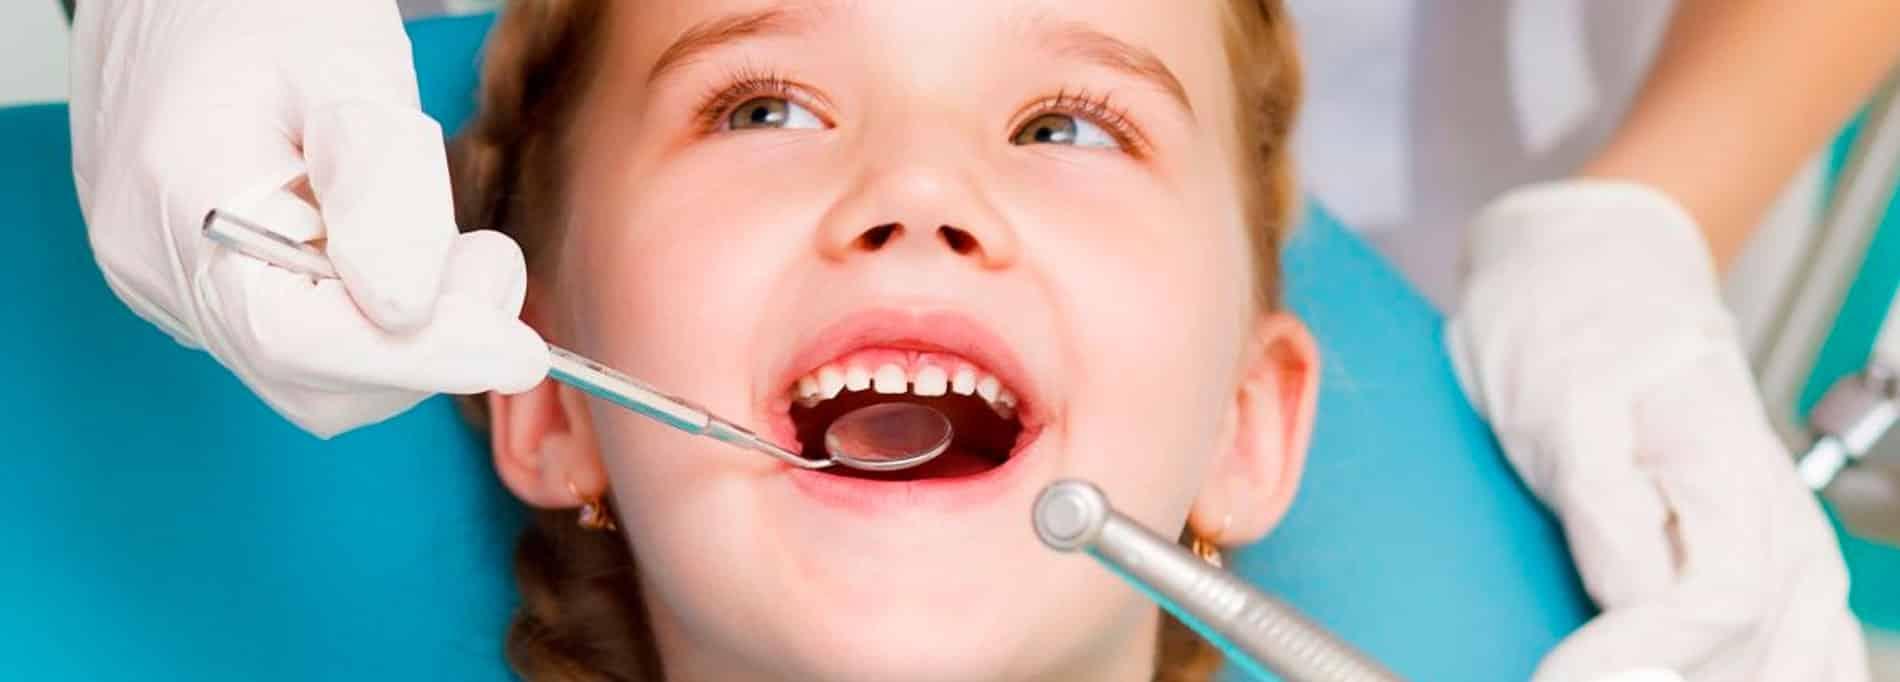 Ondontopediatria Dentistas niños en Alcorcón. Clínica dental CEM Valderas dentista infantil